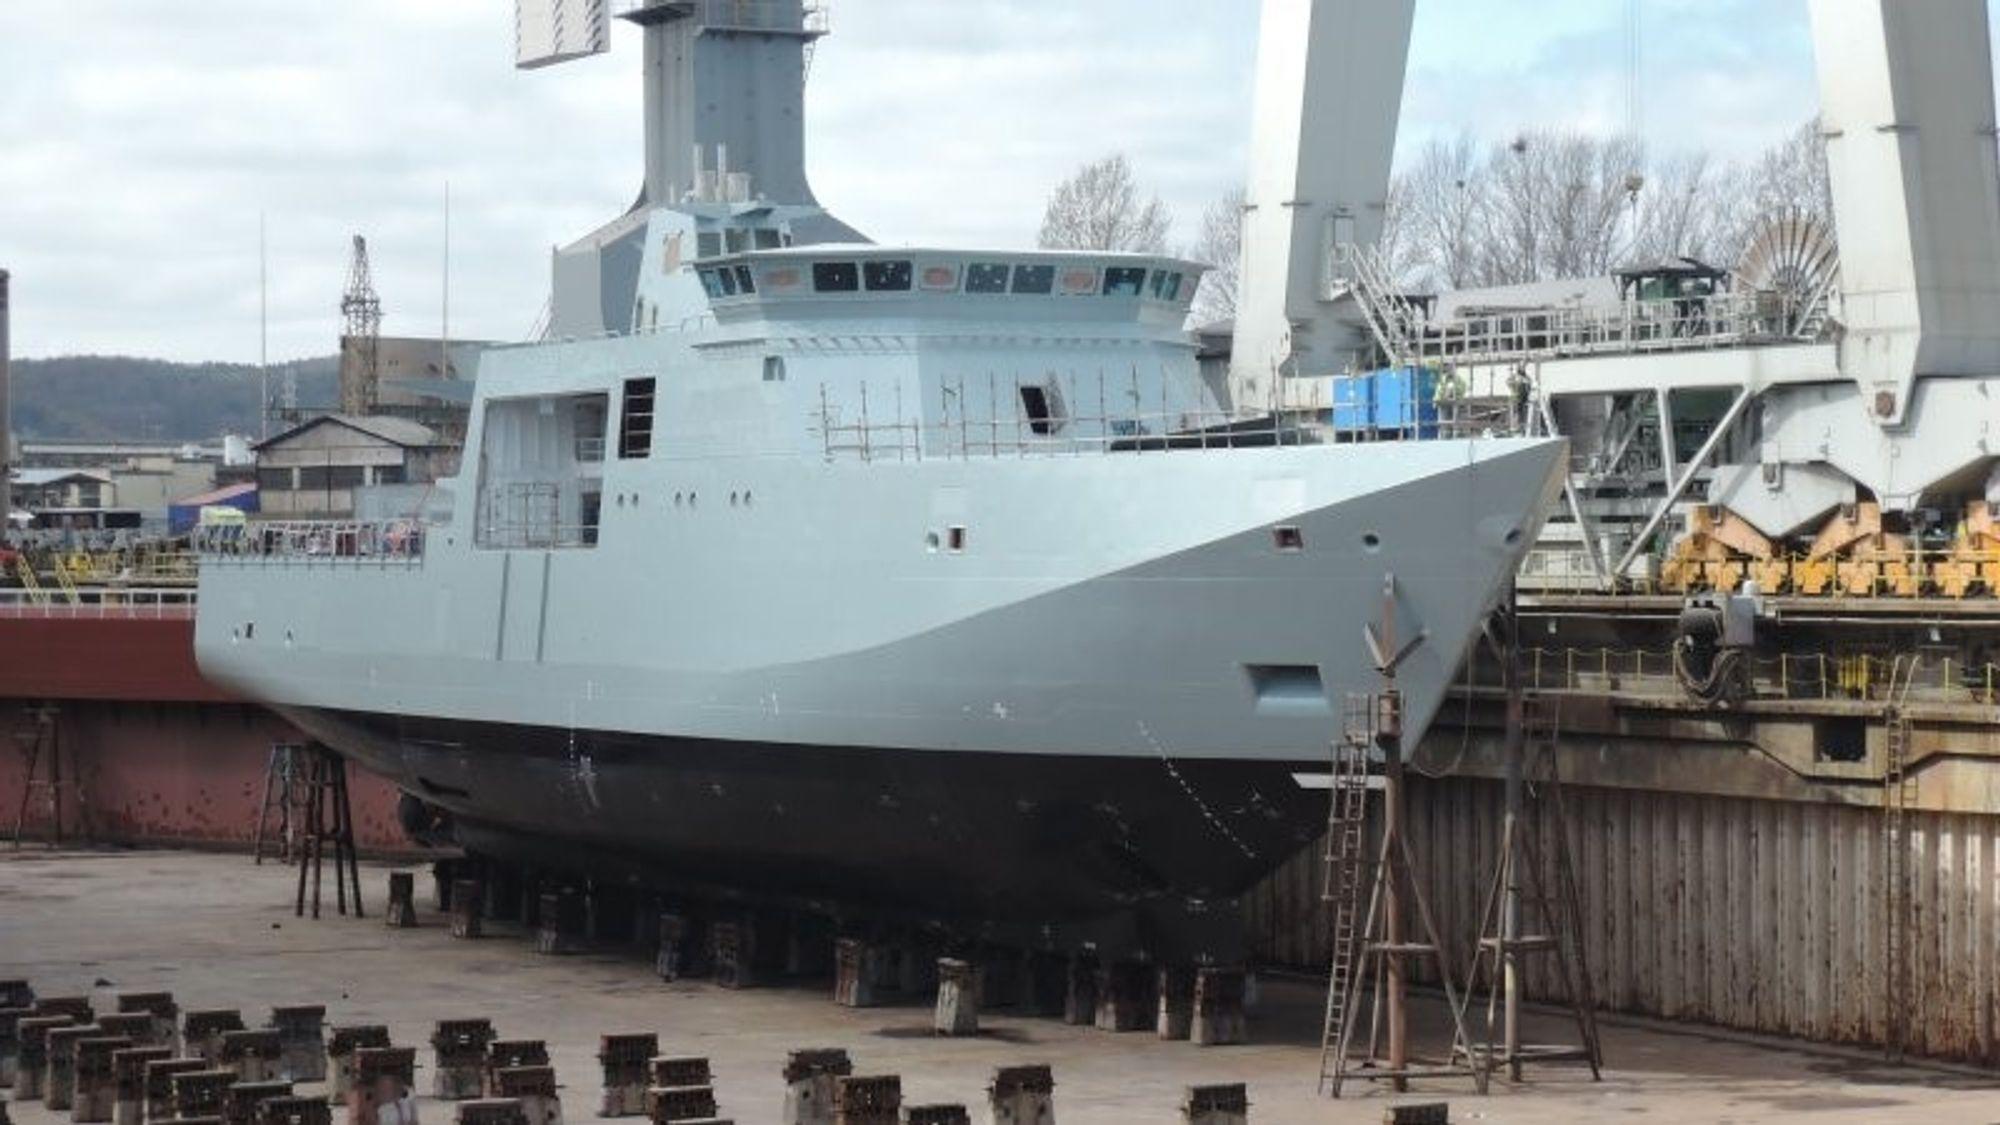 Lauge Koch i dokk under byggingen av skroget på Crist-verftet i Polen i 2014. Foto: Karstensens Skibsværft/Ingeniøren